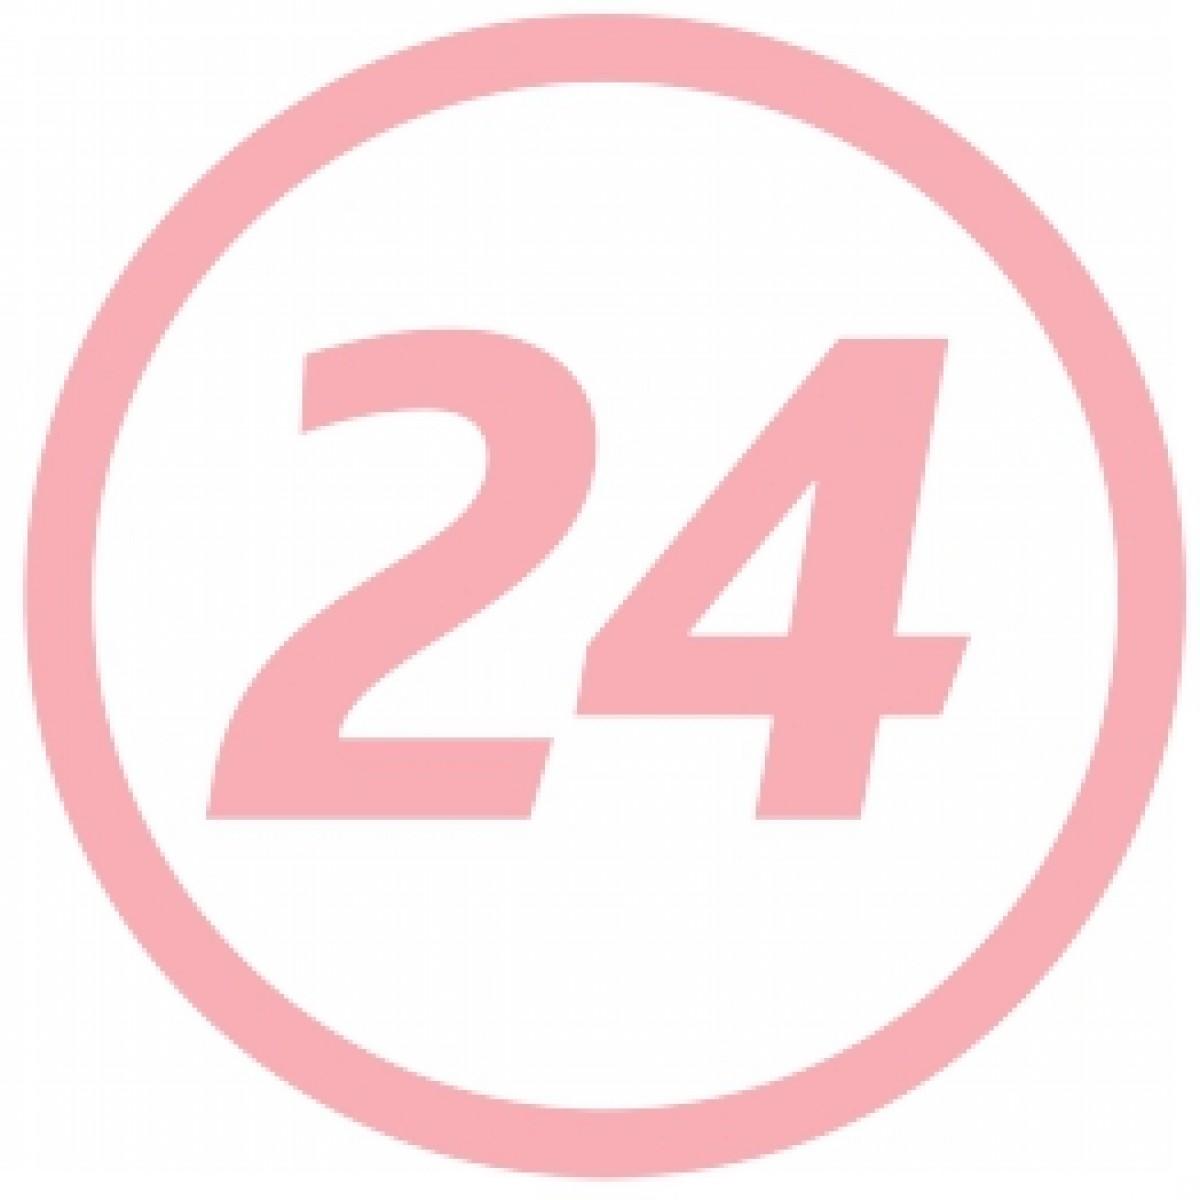 Hartmann Molicare Premium Men Pad 2 Picaturi Tampoane pentru Incontinenta Usoara, Tampoane, 14buc